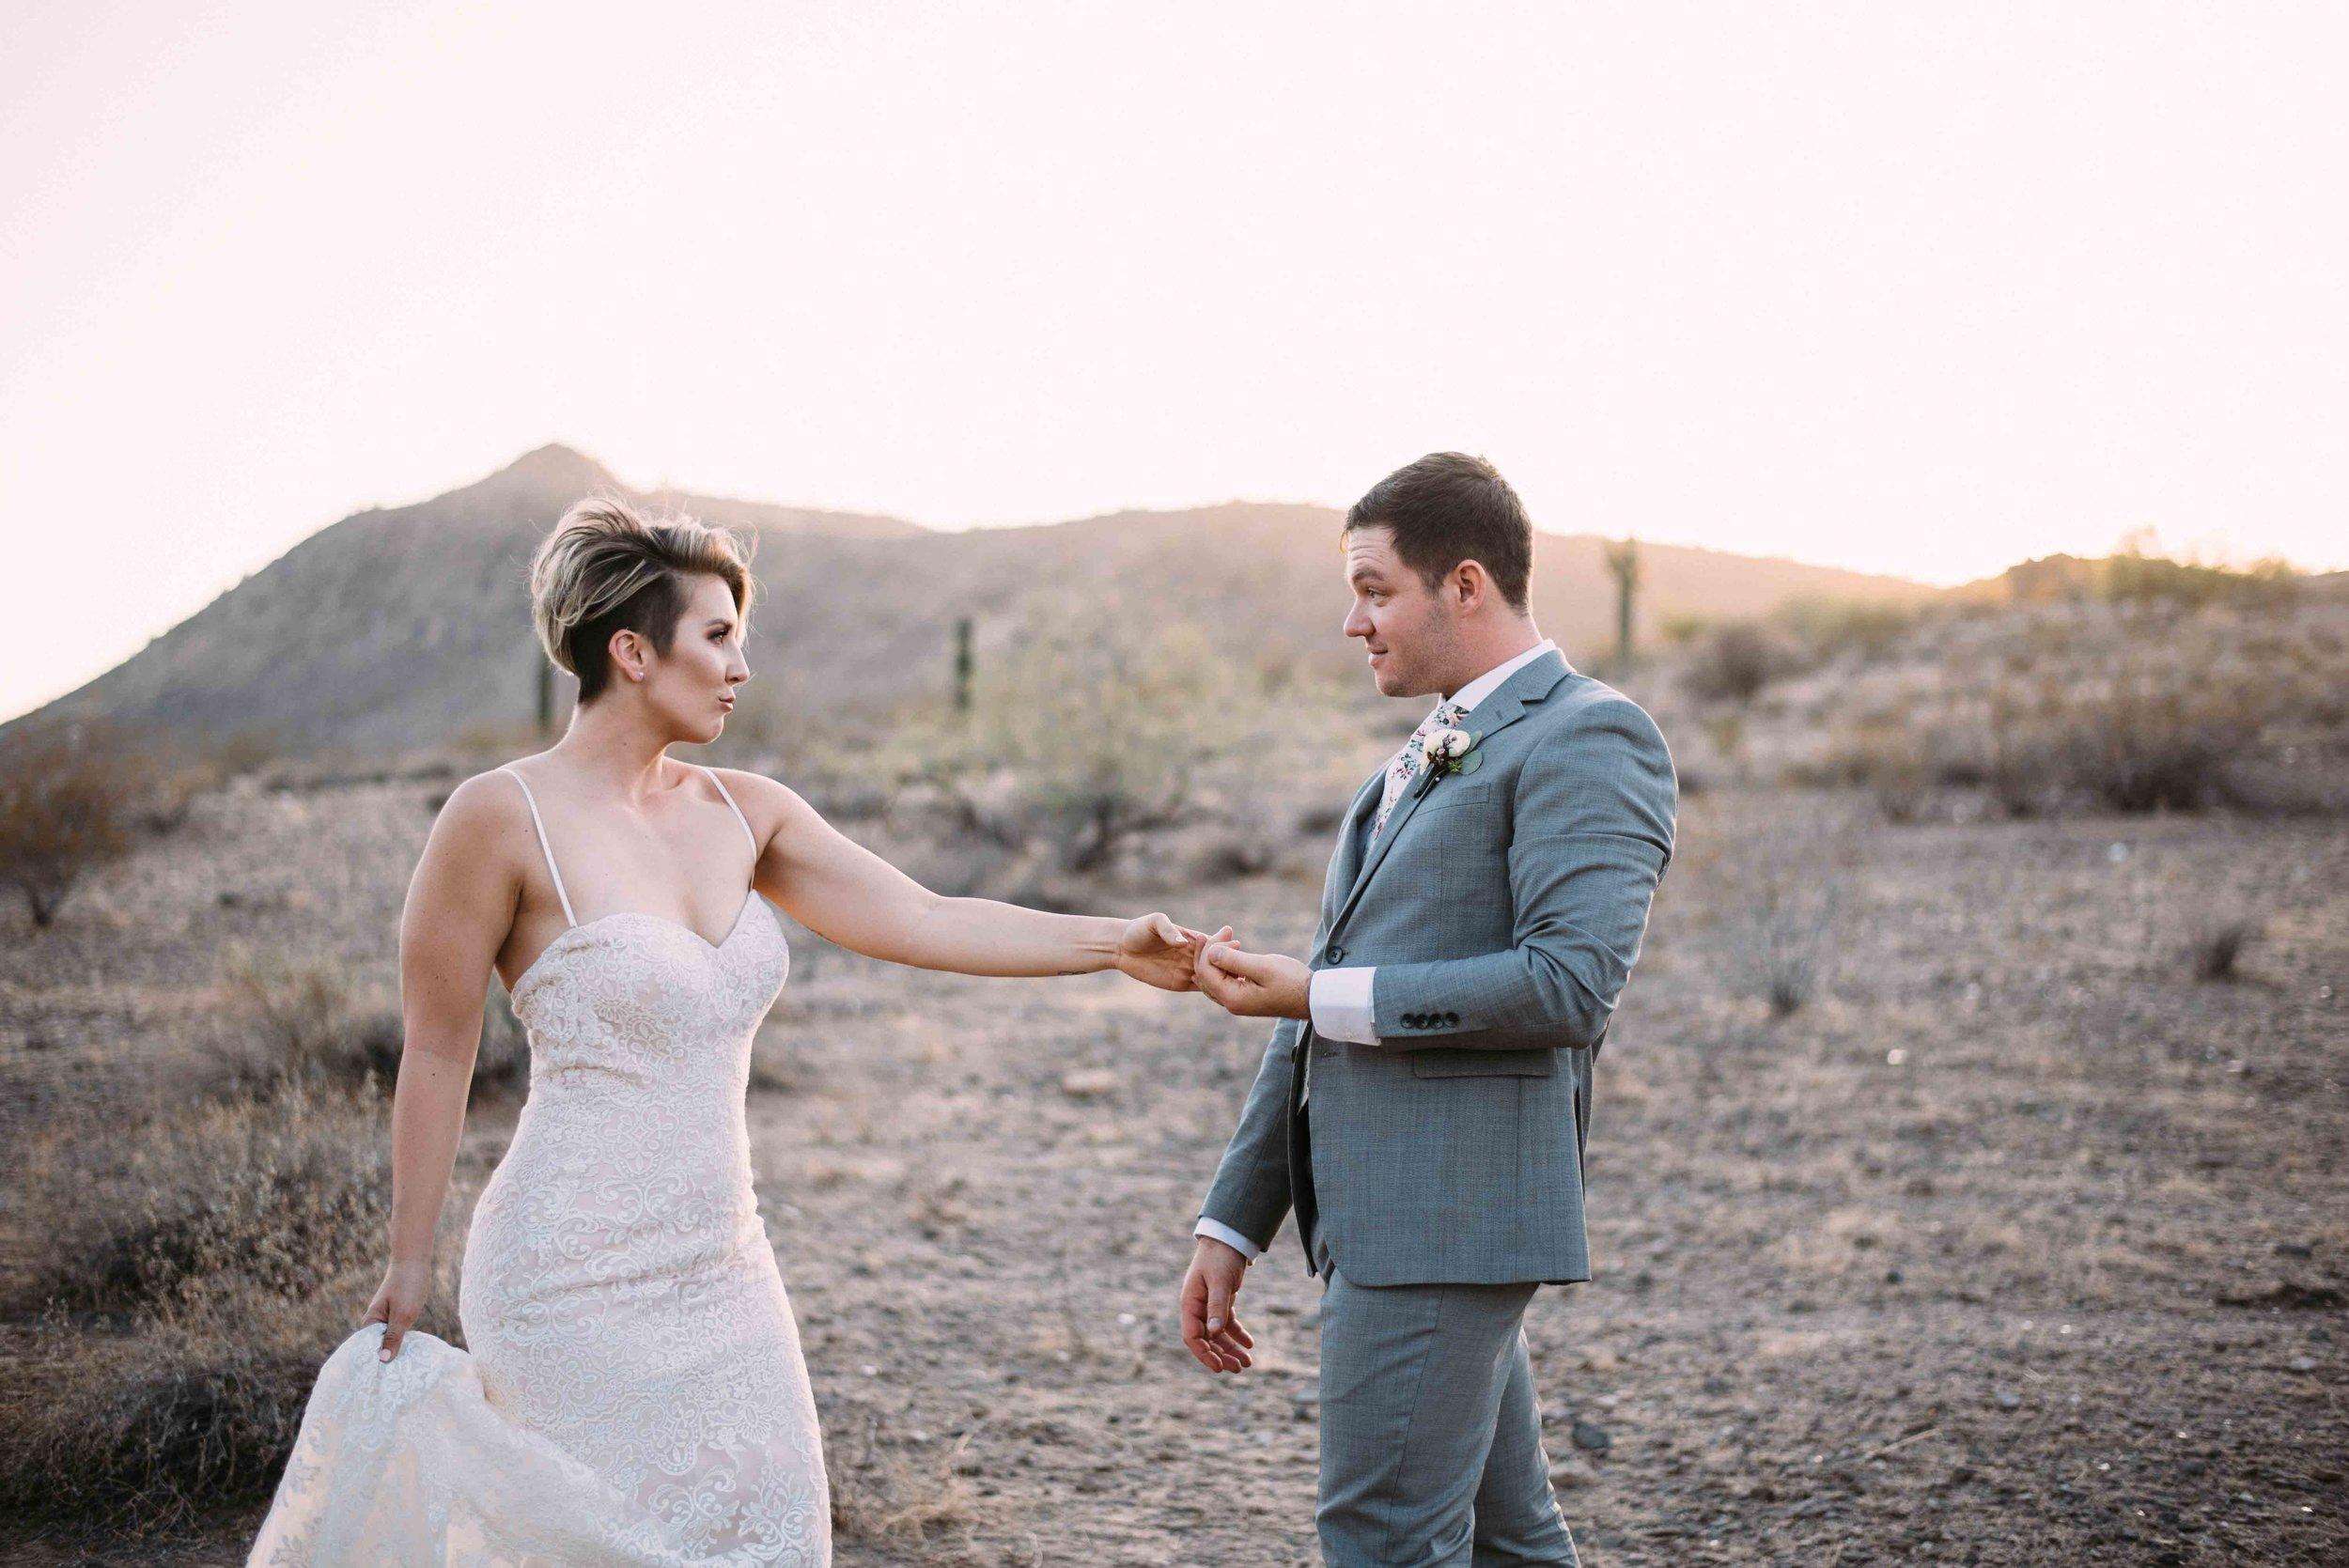 Phoenix_Arizona_Wedding_Blog_AlyssaRyanPhotography77.jpg